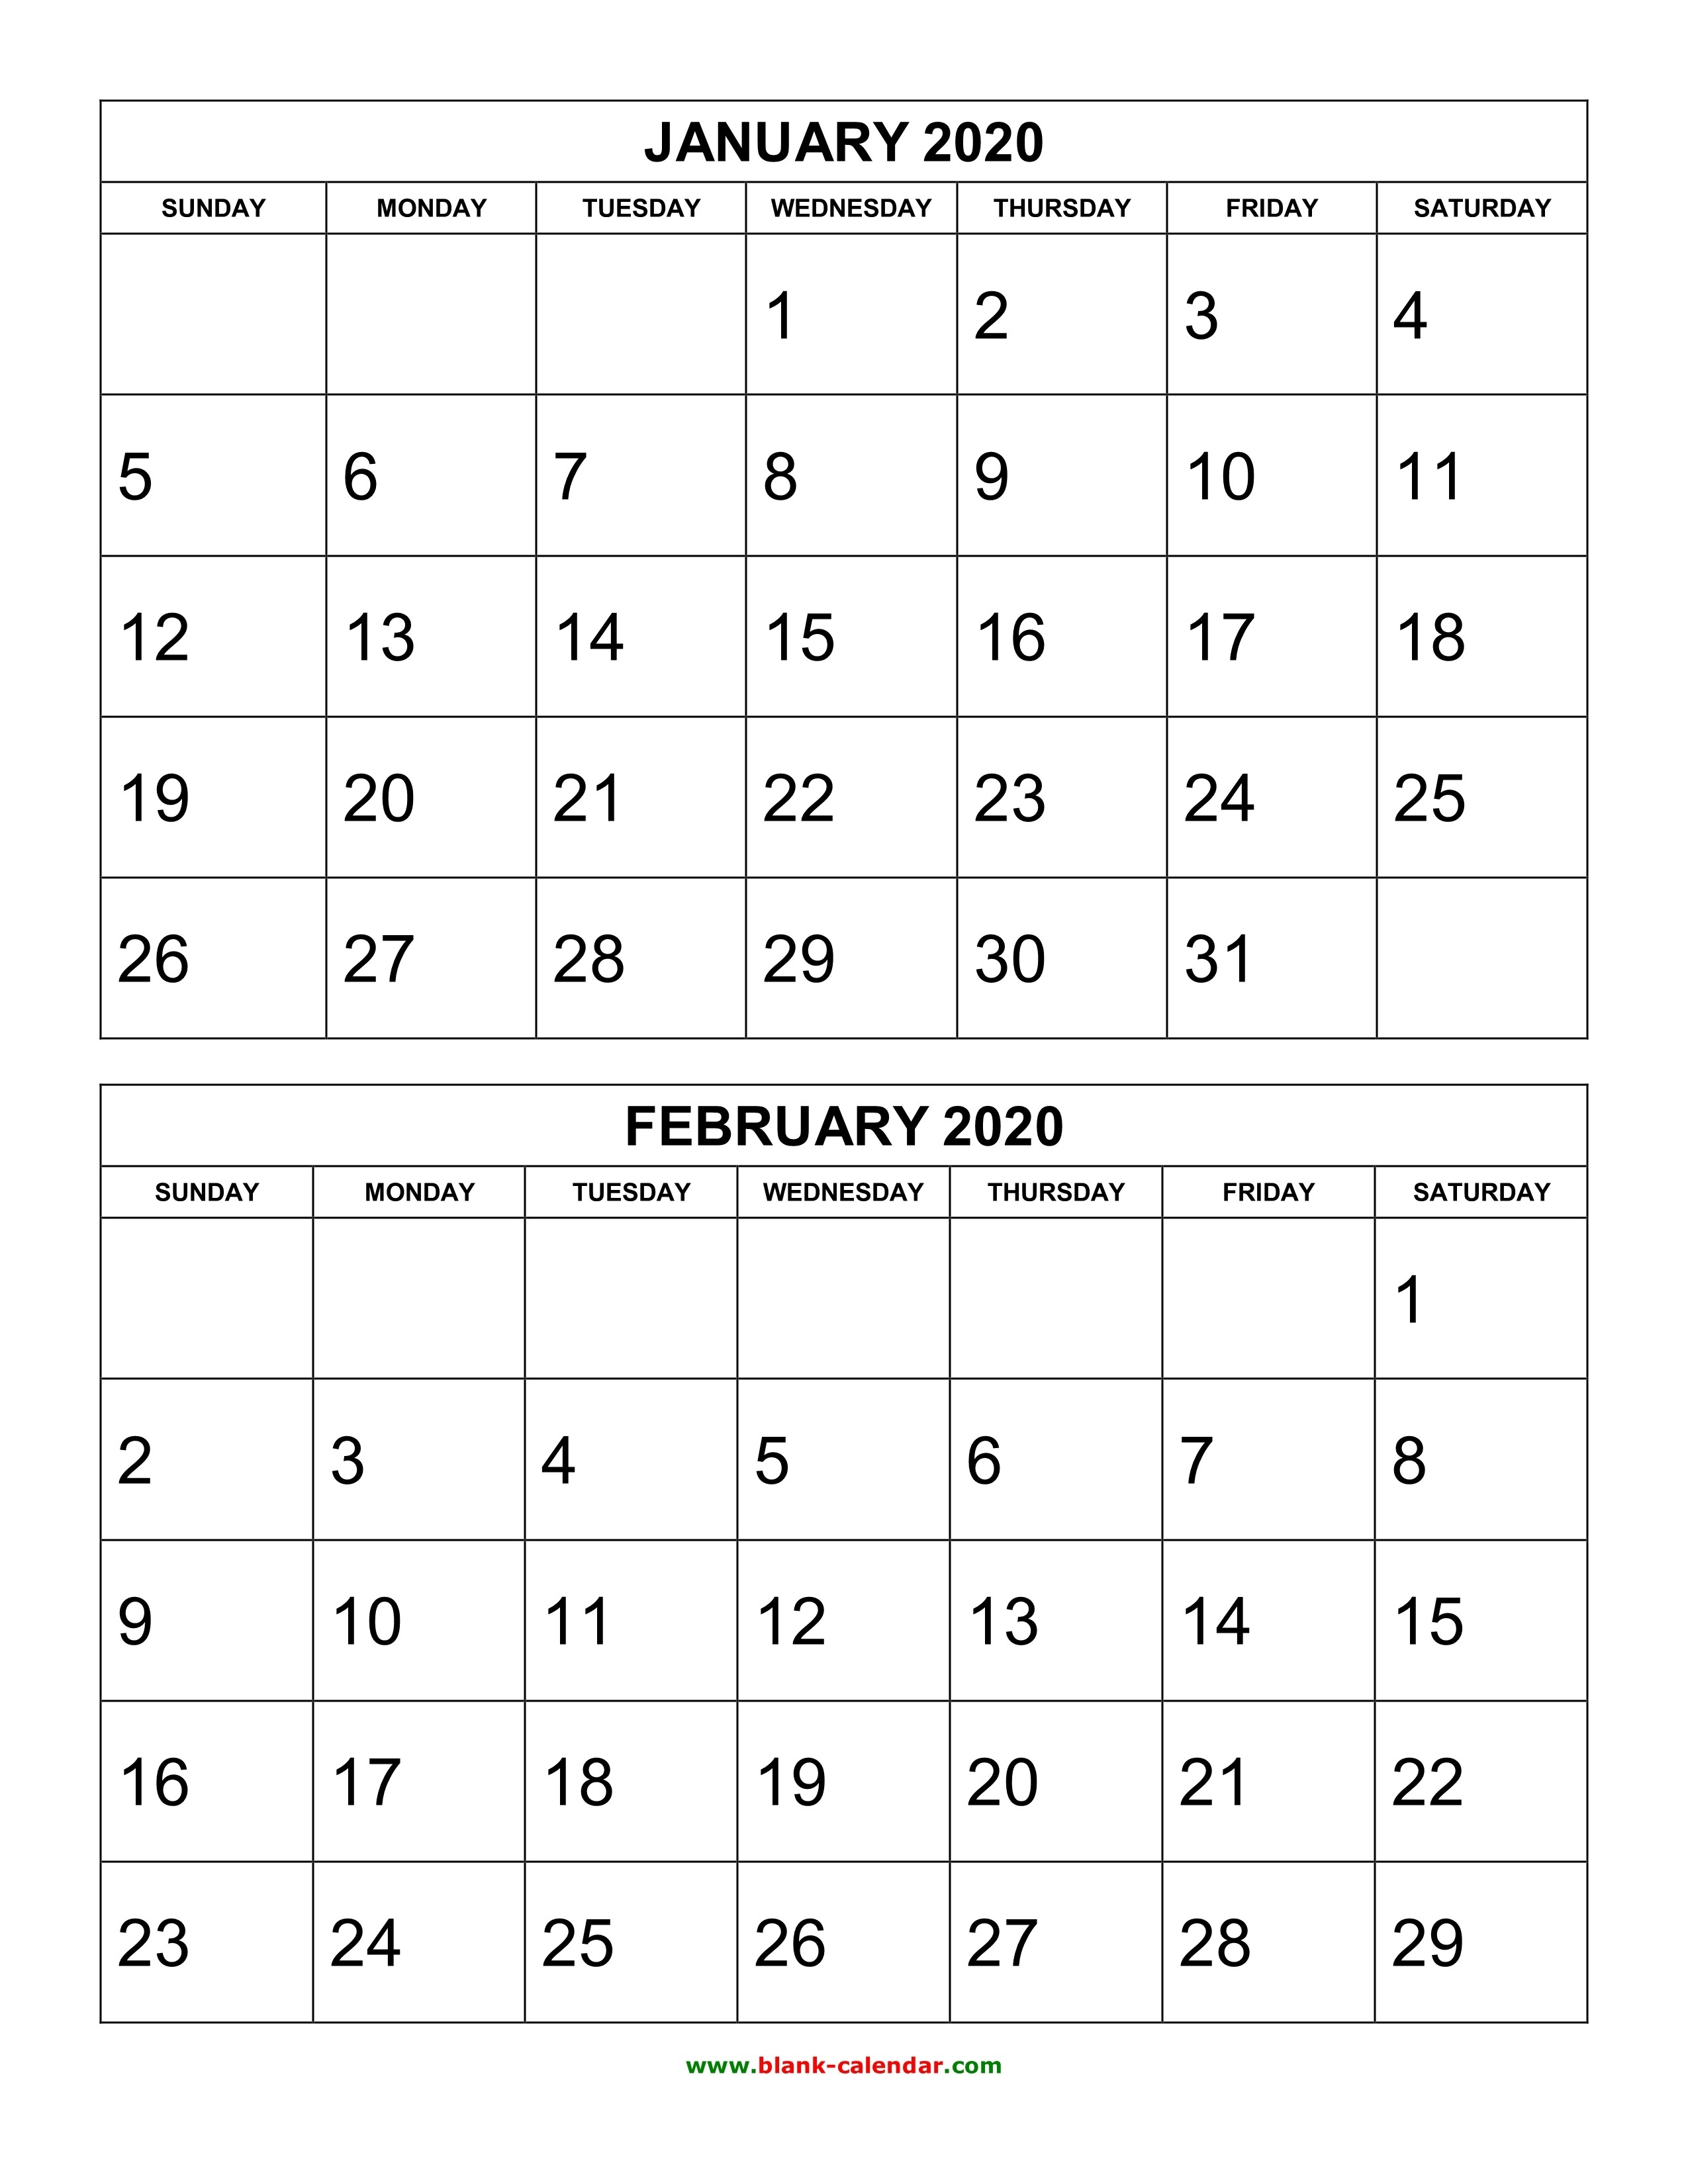 Free Download Printable Calendar 2020, 2 Months Per Page, 6-Free Printable 2 Page Monthly Calendar 2020